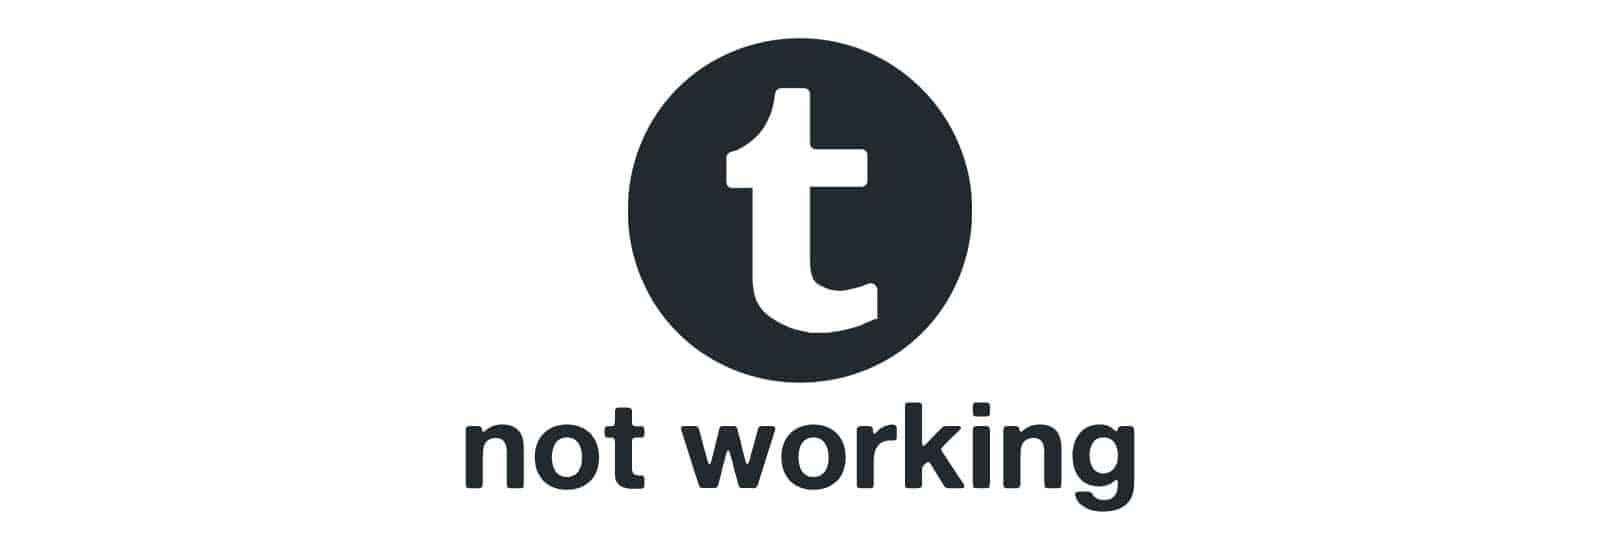 tumblr-not-working